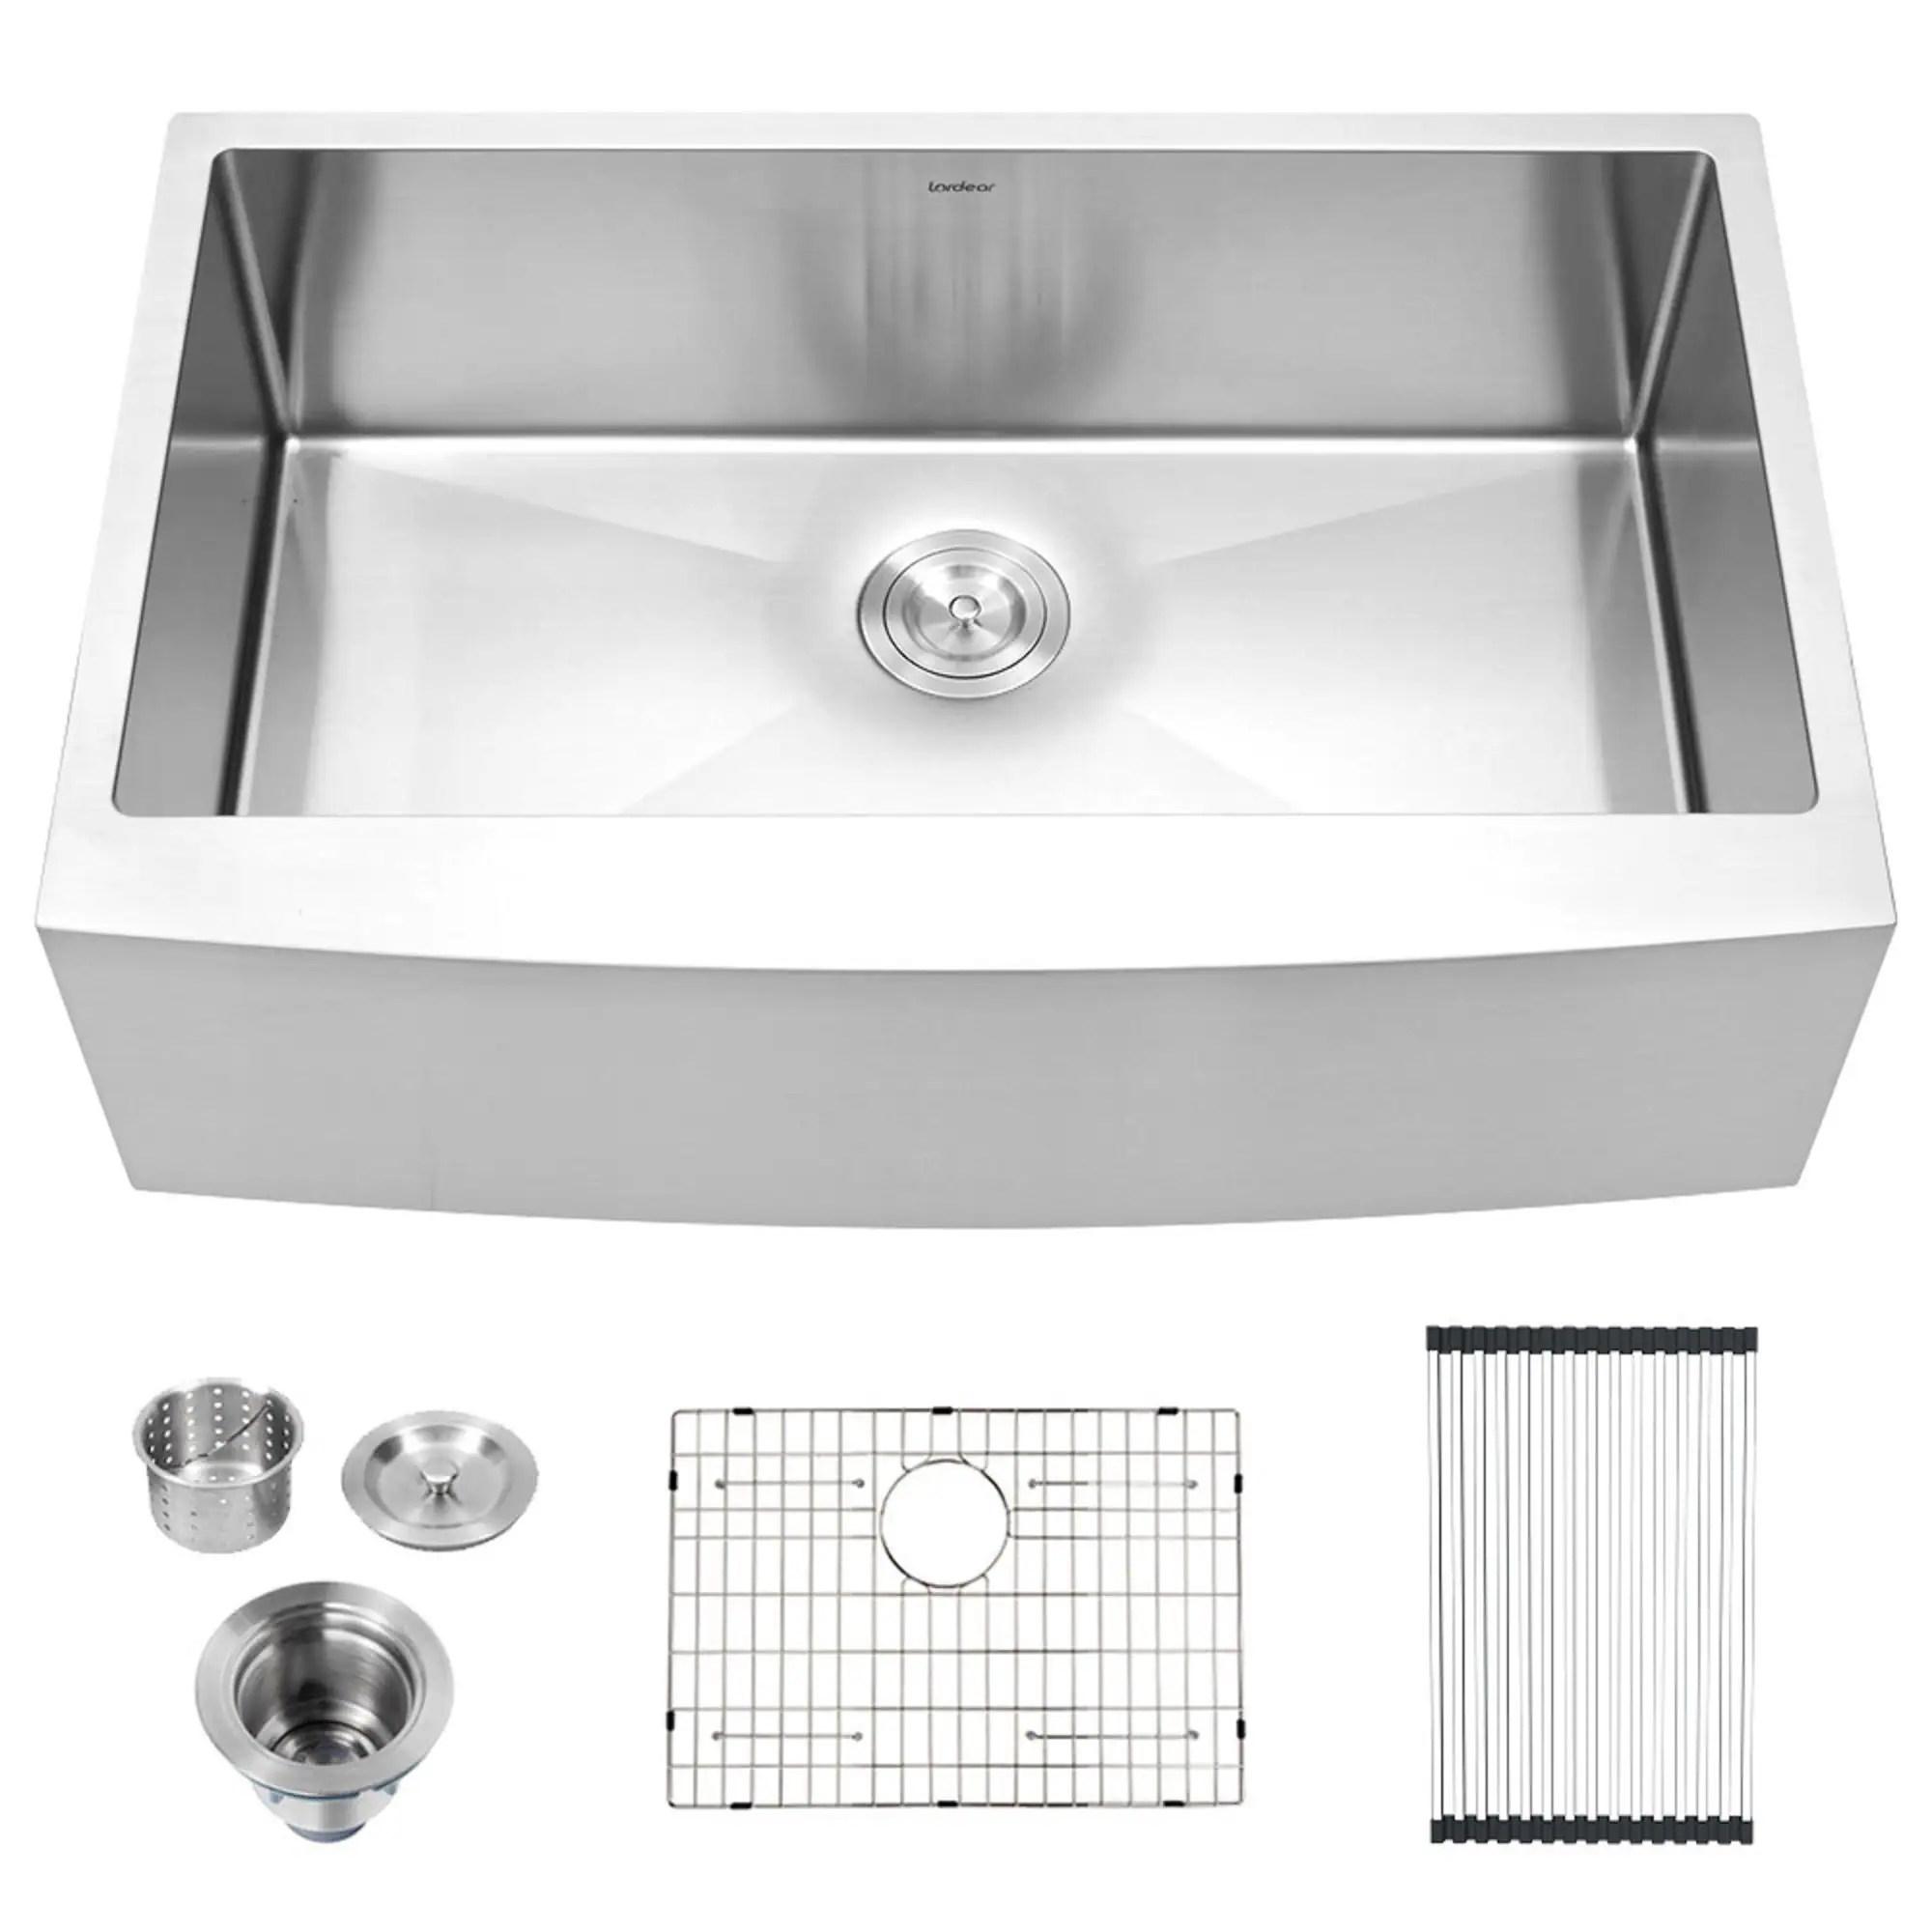 lordear 33 inch farmhouse kitchen sink 16 gauge stainless steel apron front single bowl farm kitchen sink